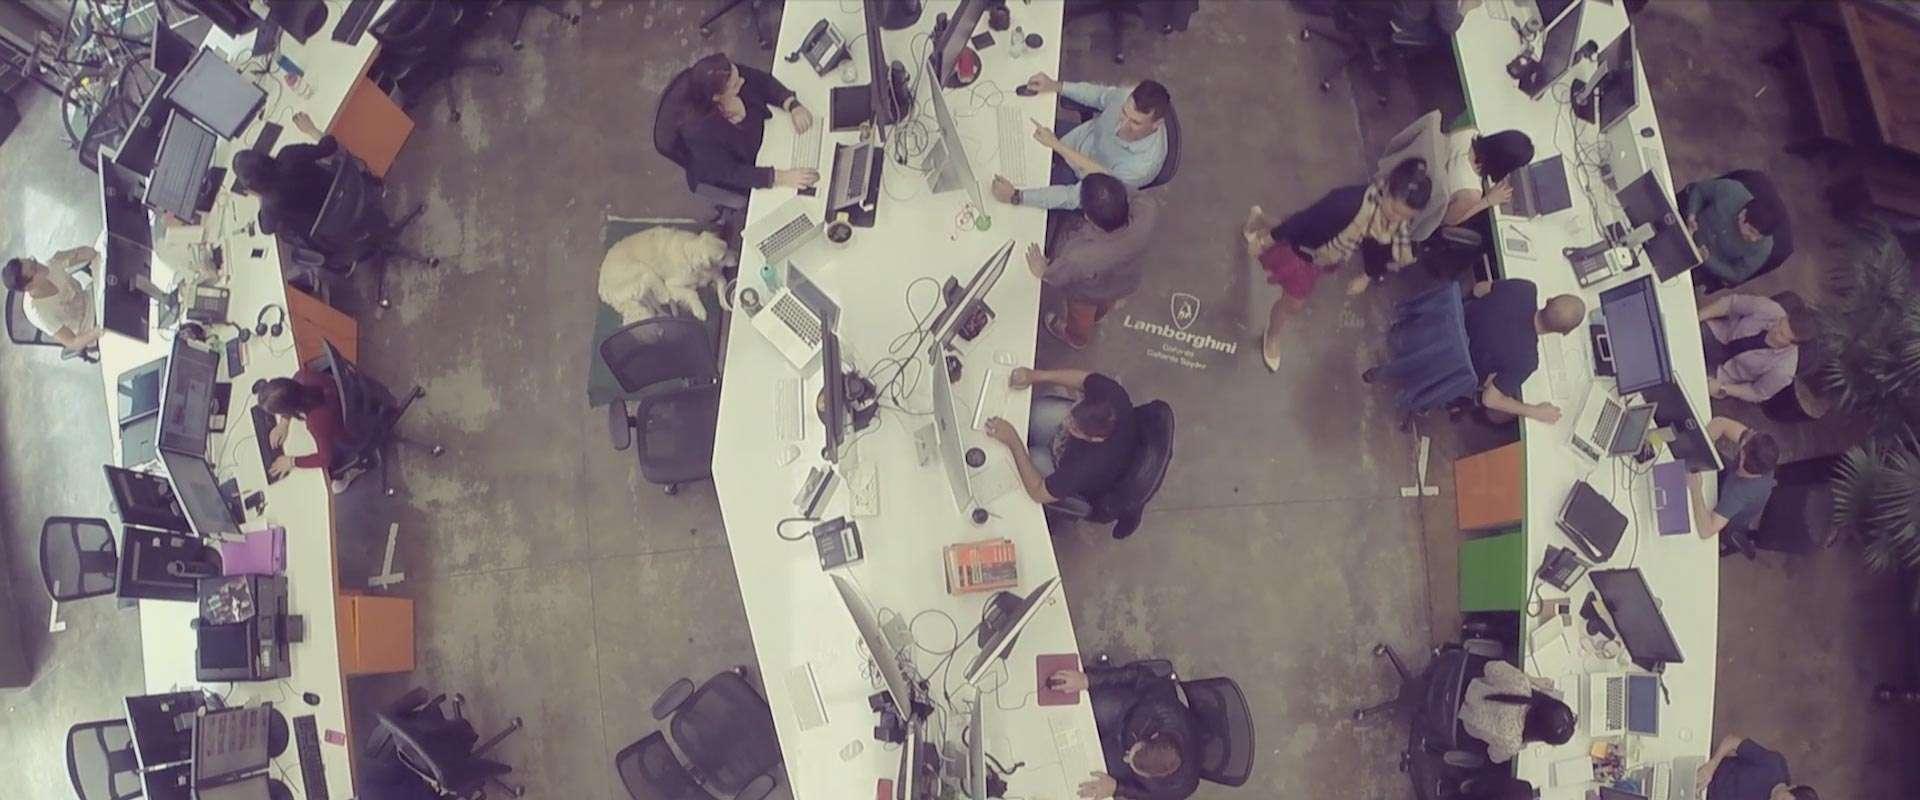 banner_aerial-large.jpg